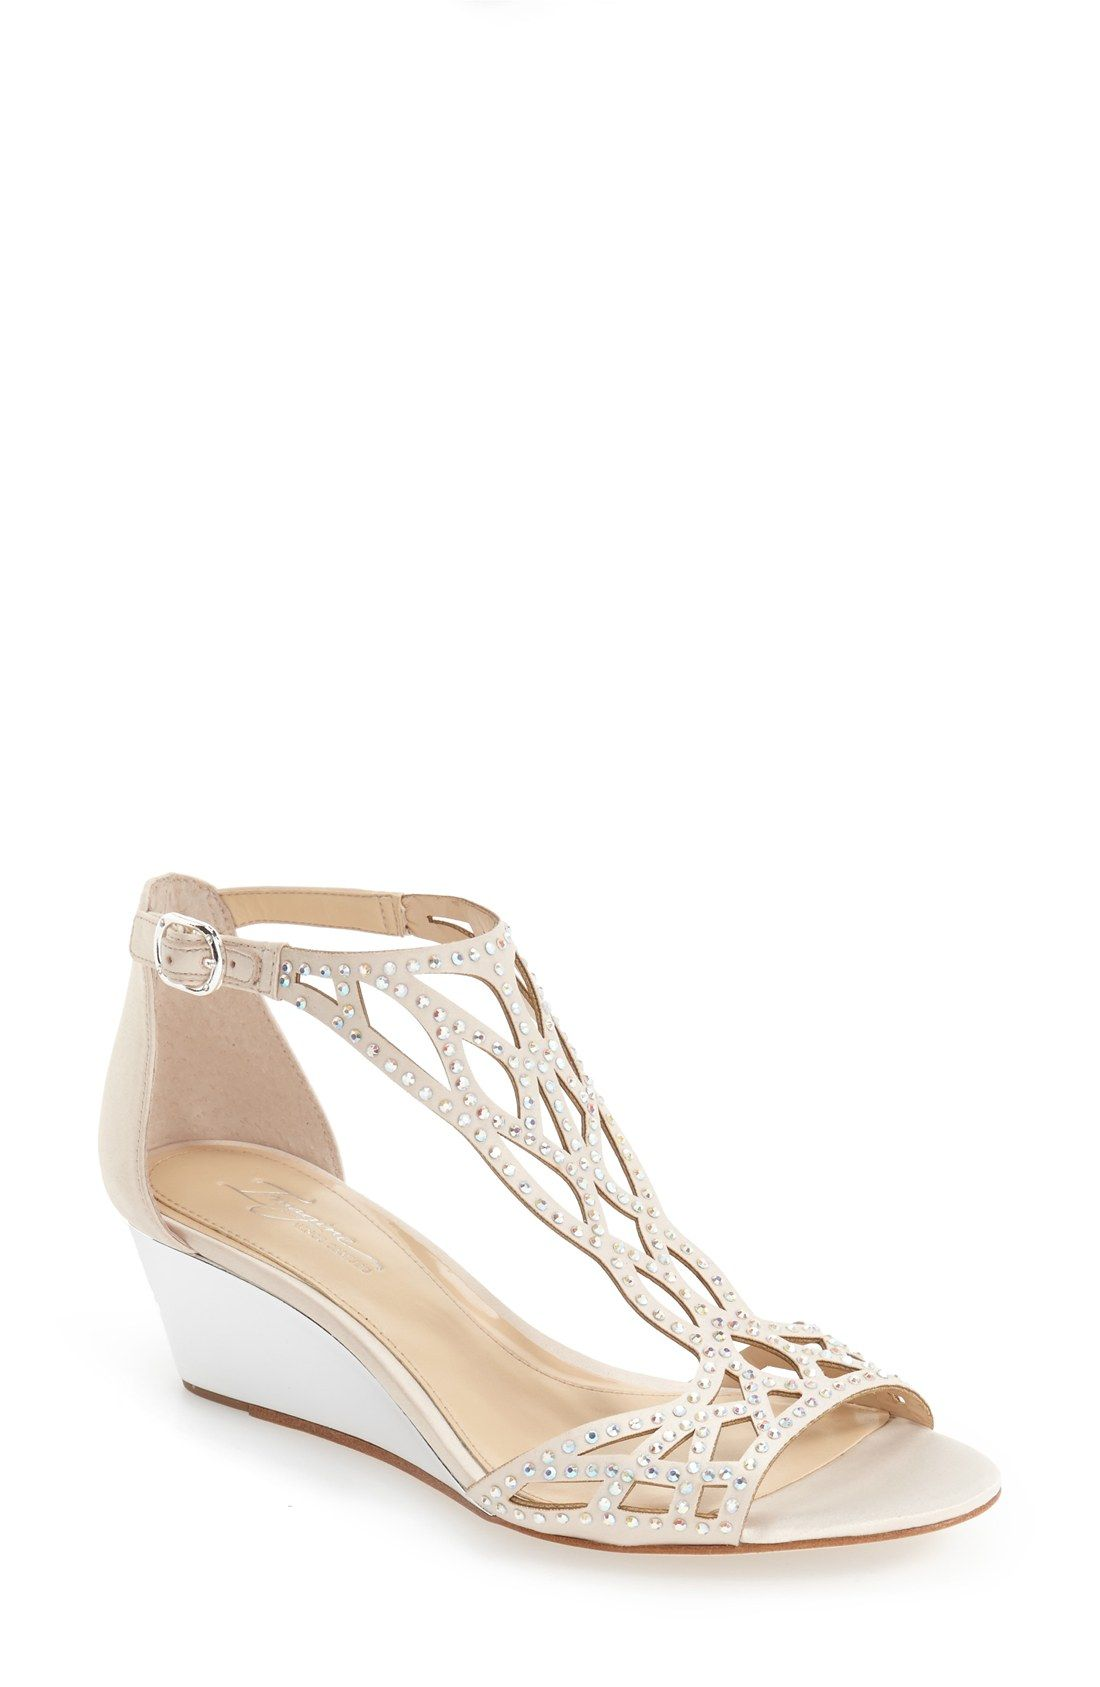 Wedding shoe with low heel Mrs Manno Pinterest